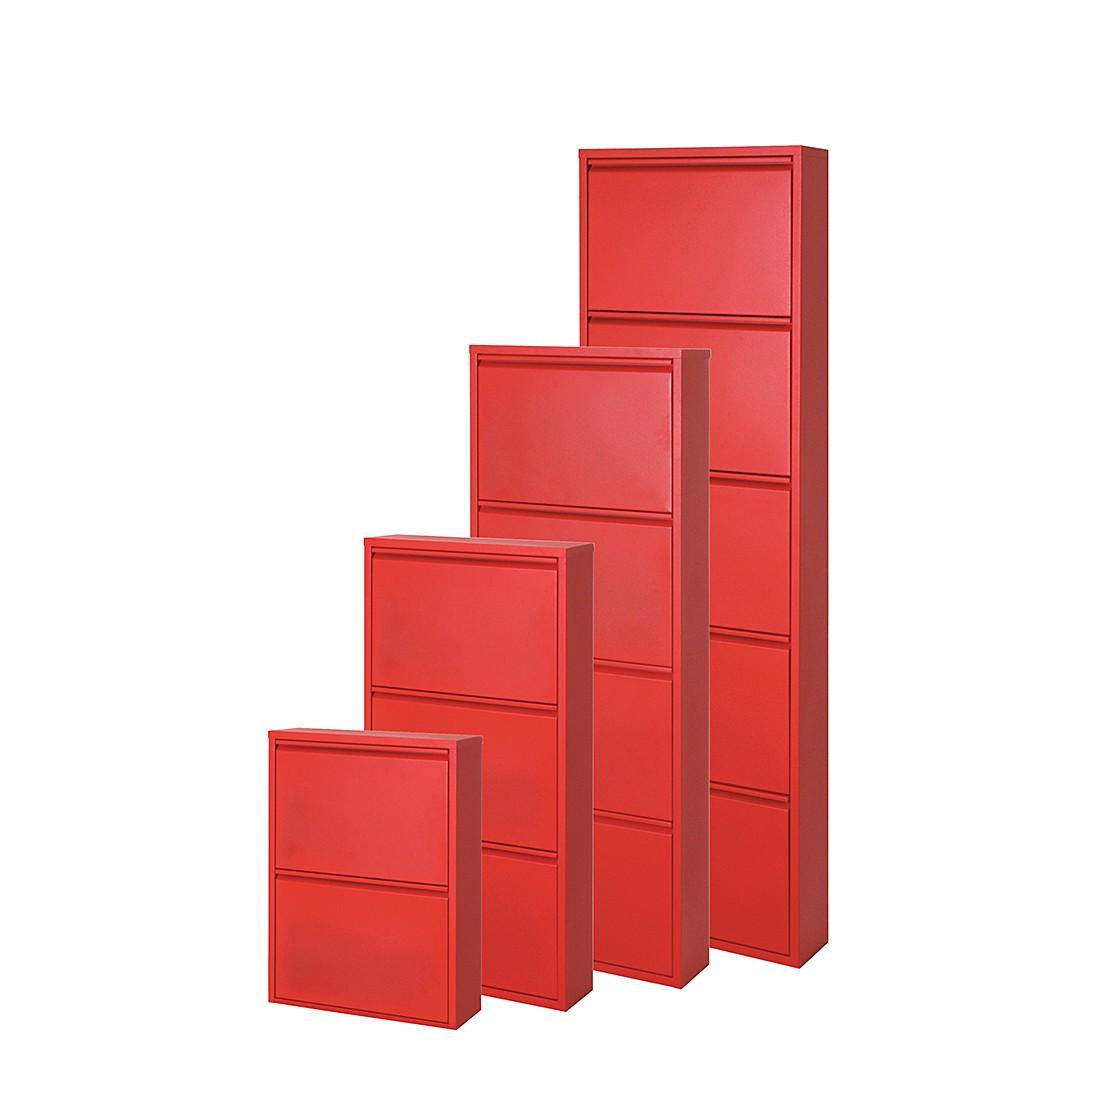 Schuhschrank Cabinet – Rot – 2 Klappen – Höhe 70 cm, Magazin-Möbel günstig